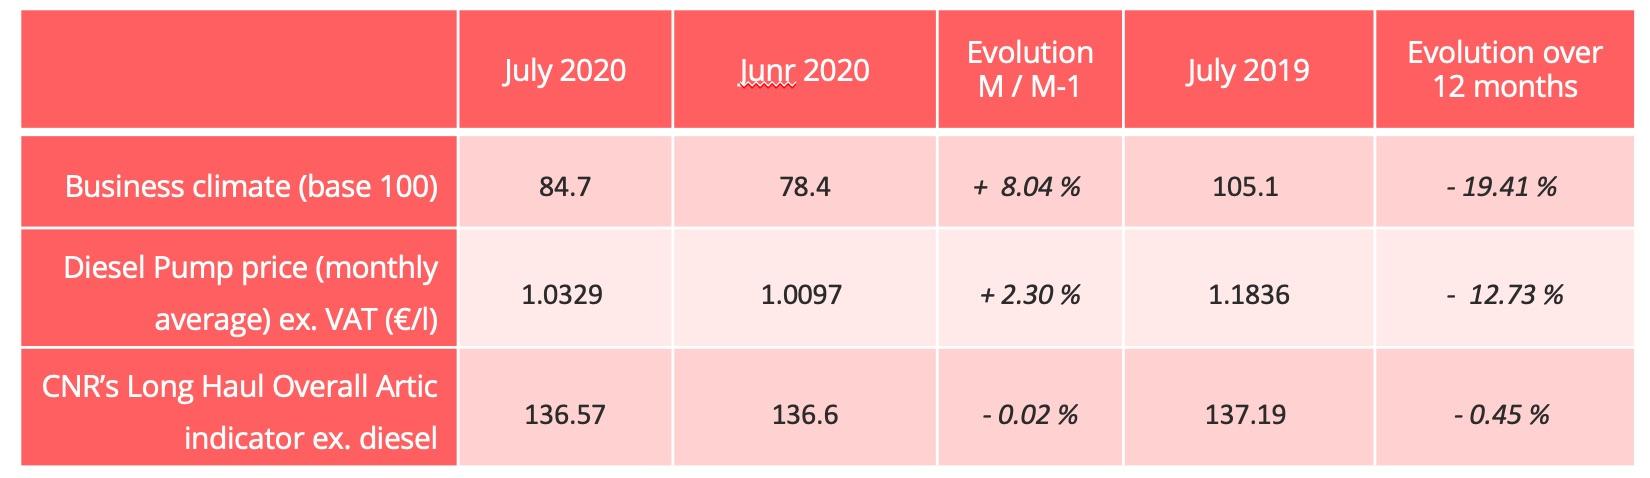 economical_conjoncture_july_2020